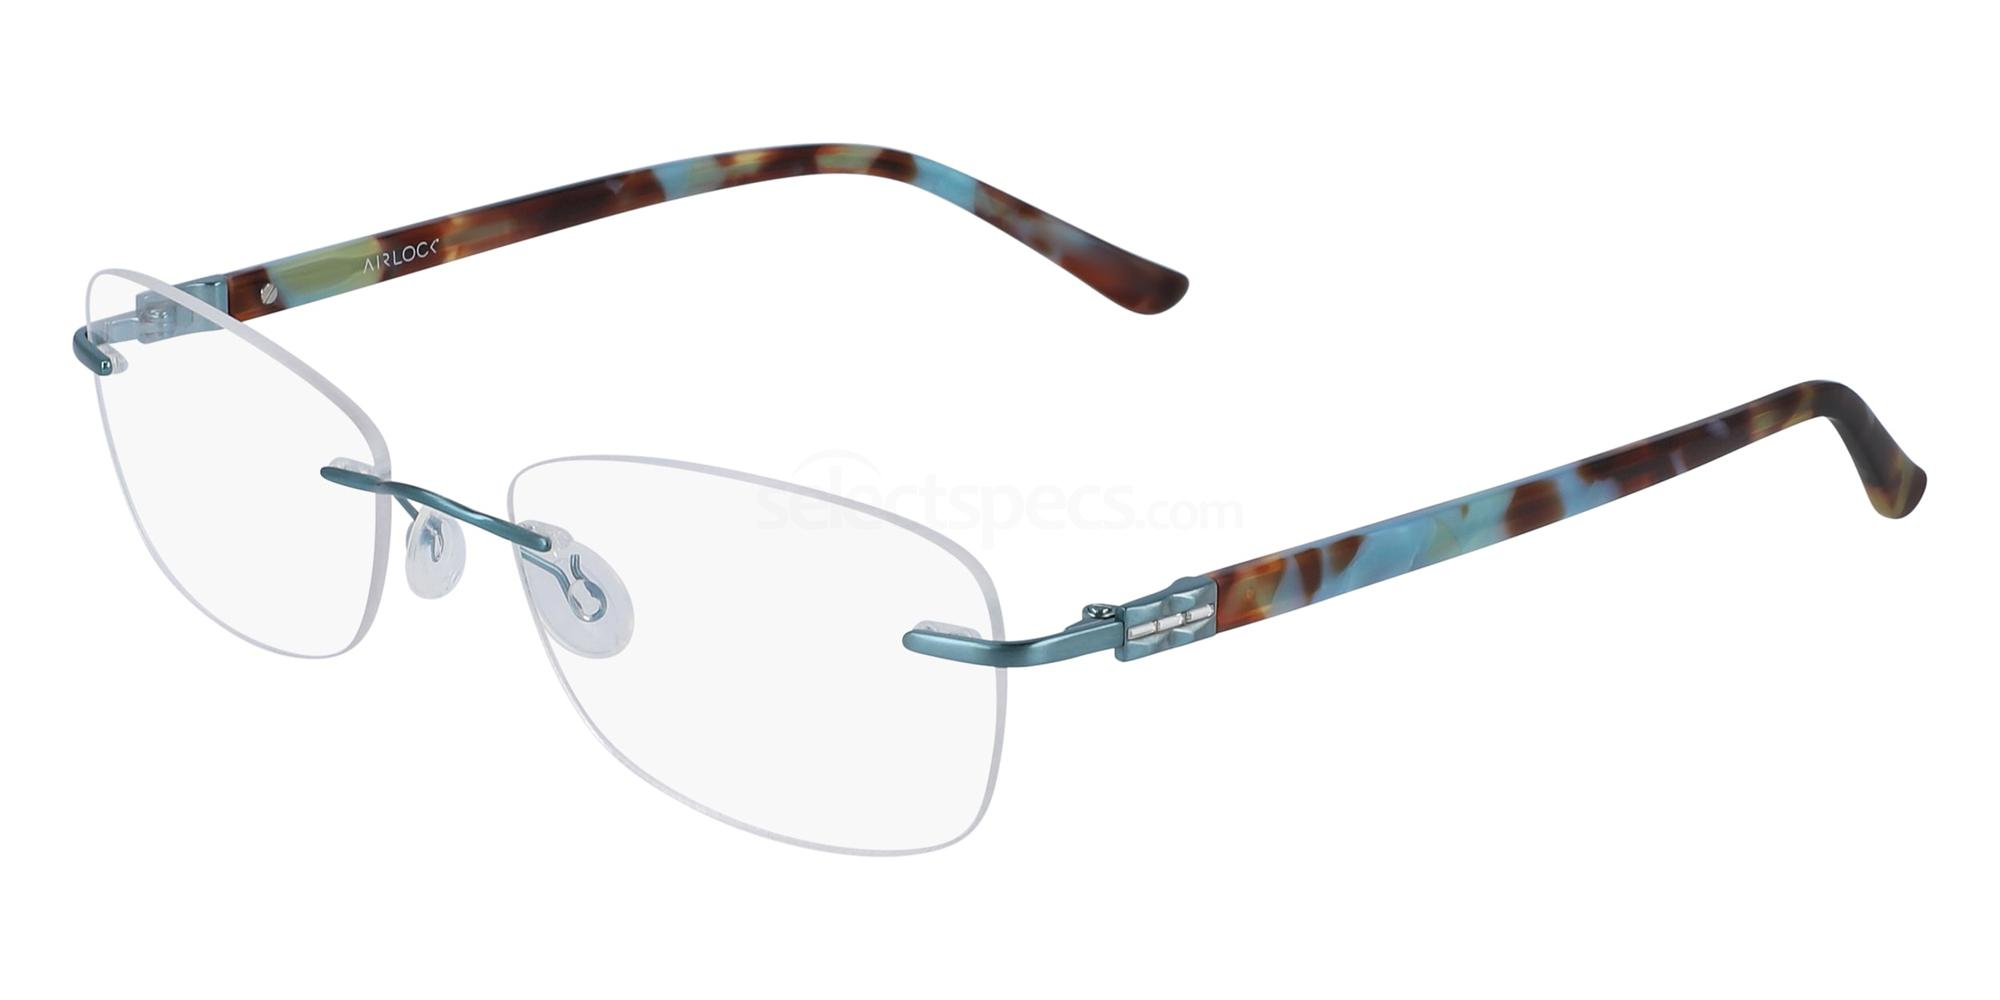 300 GRACE 201 Glasses, AIRLOCK